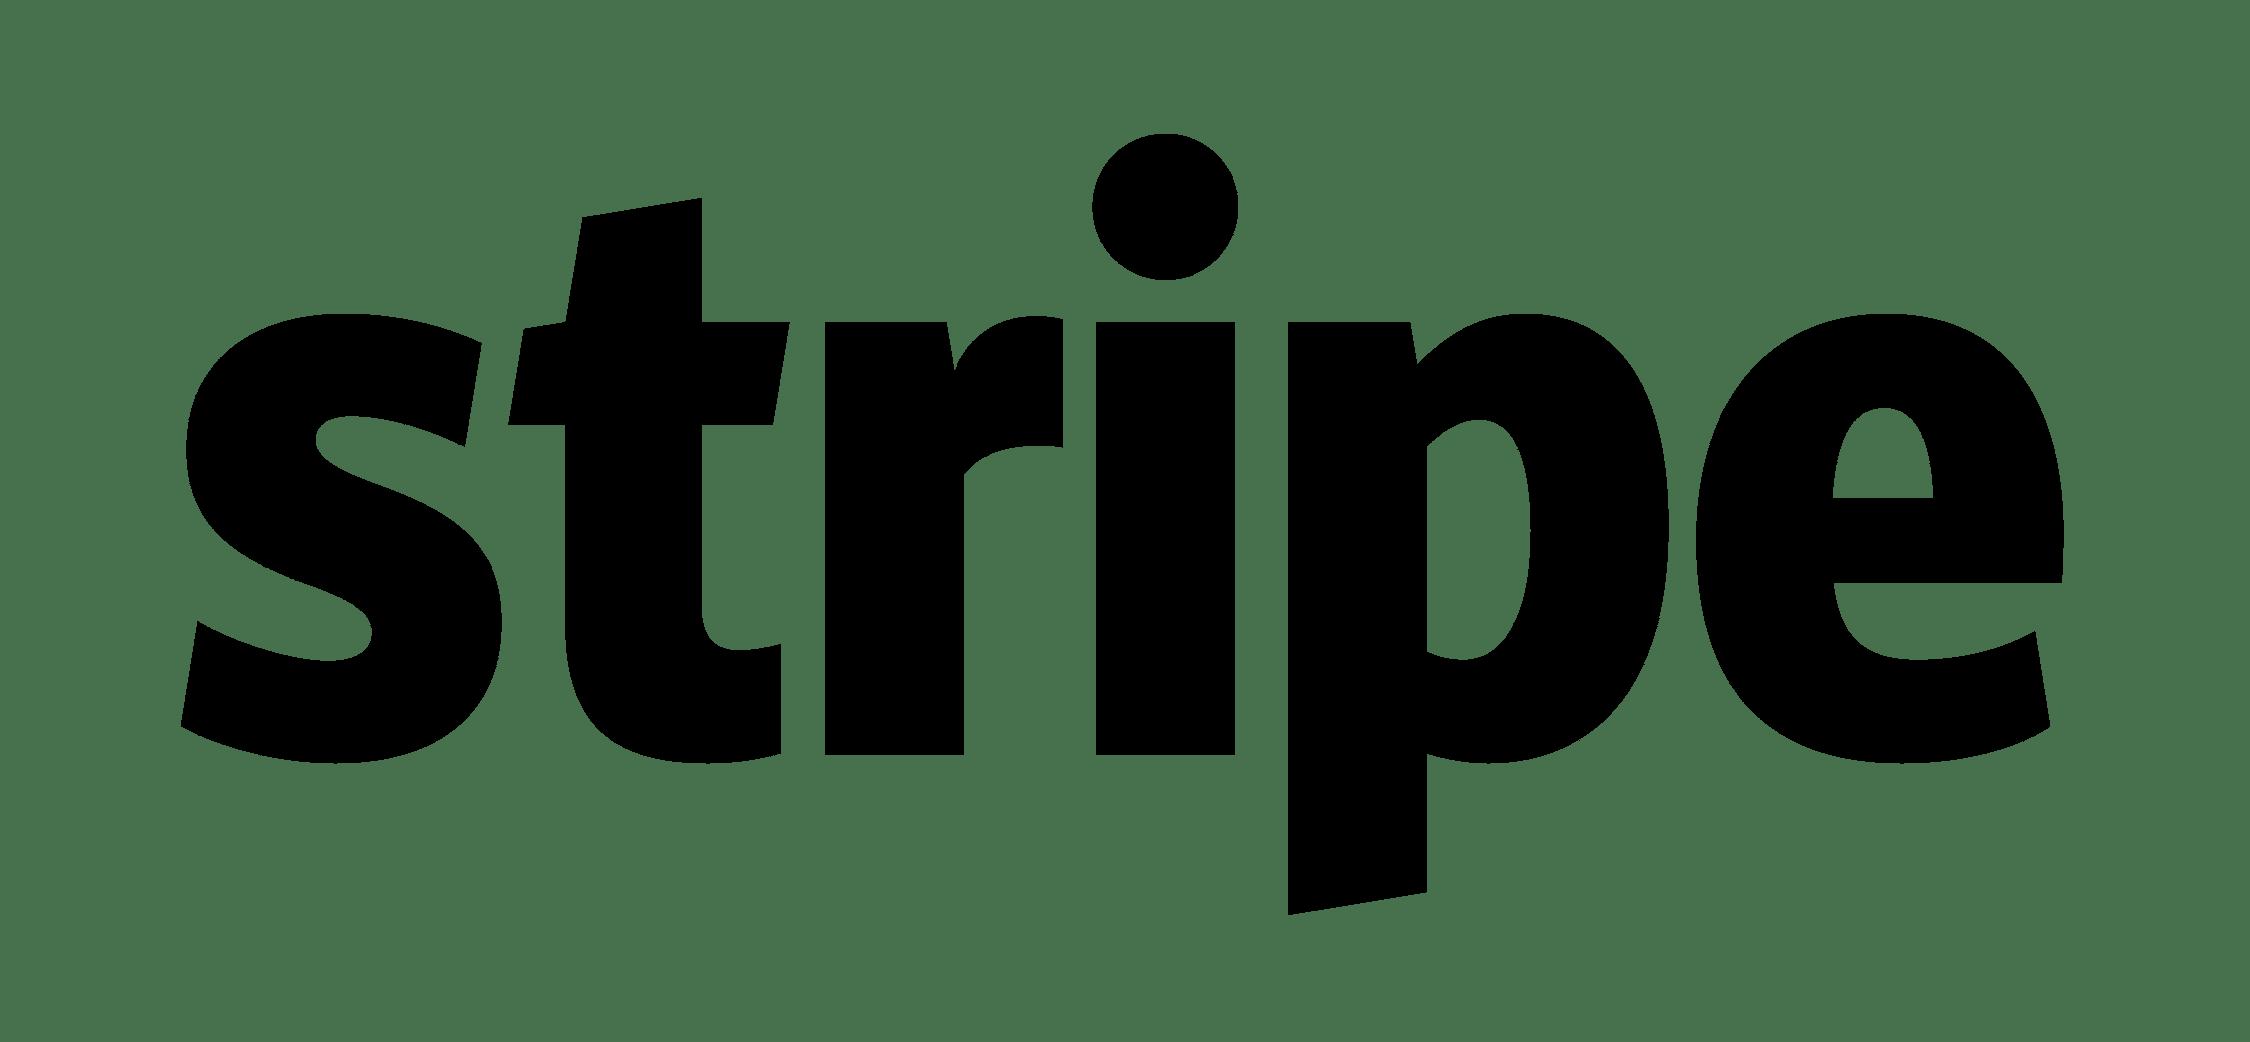 「stripe logo」の画像検索結果